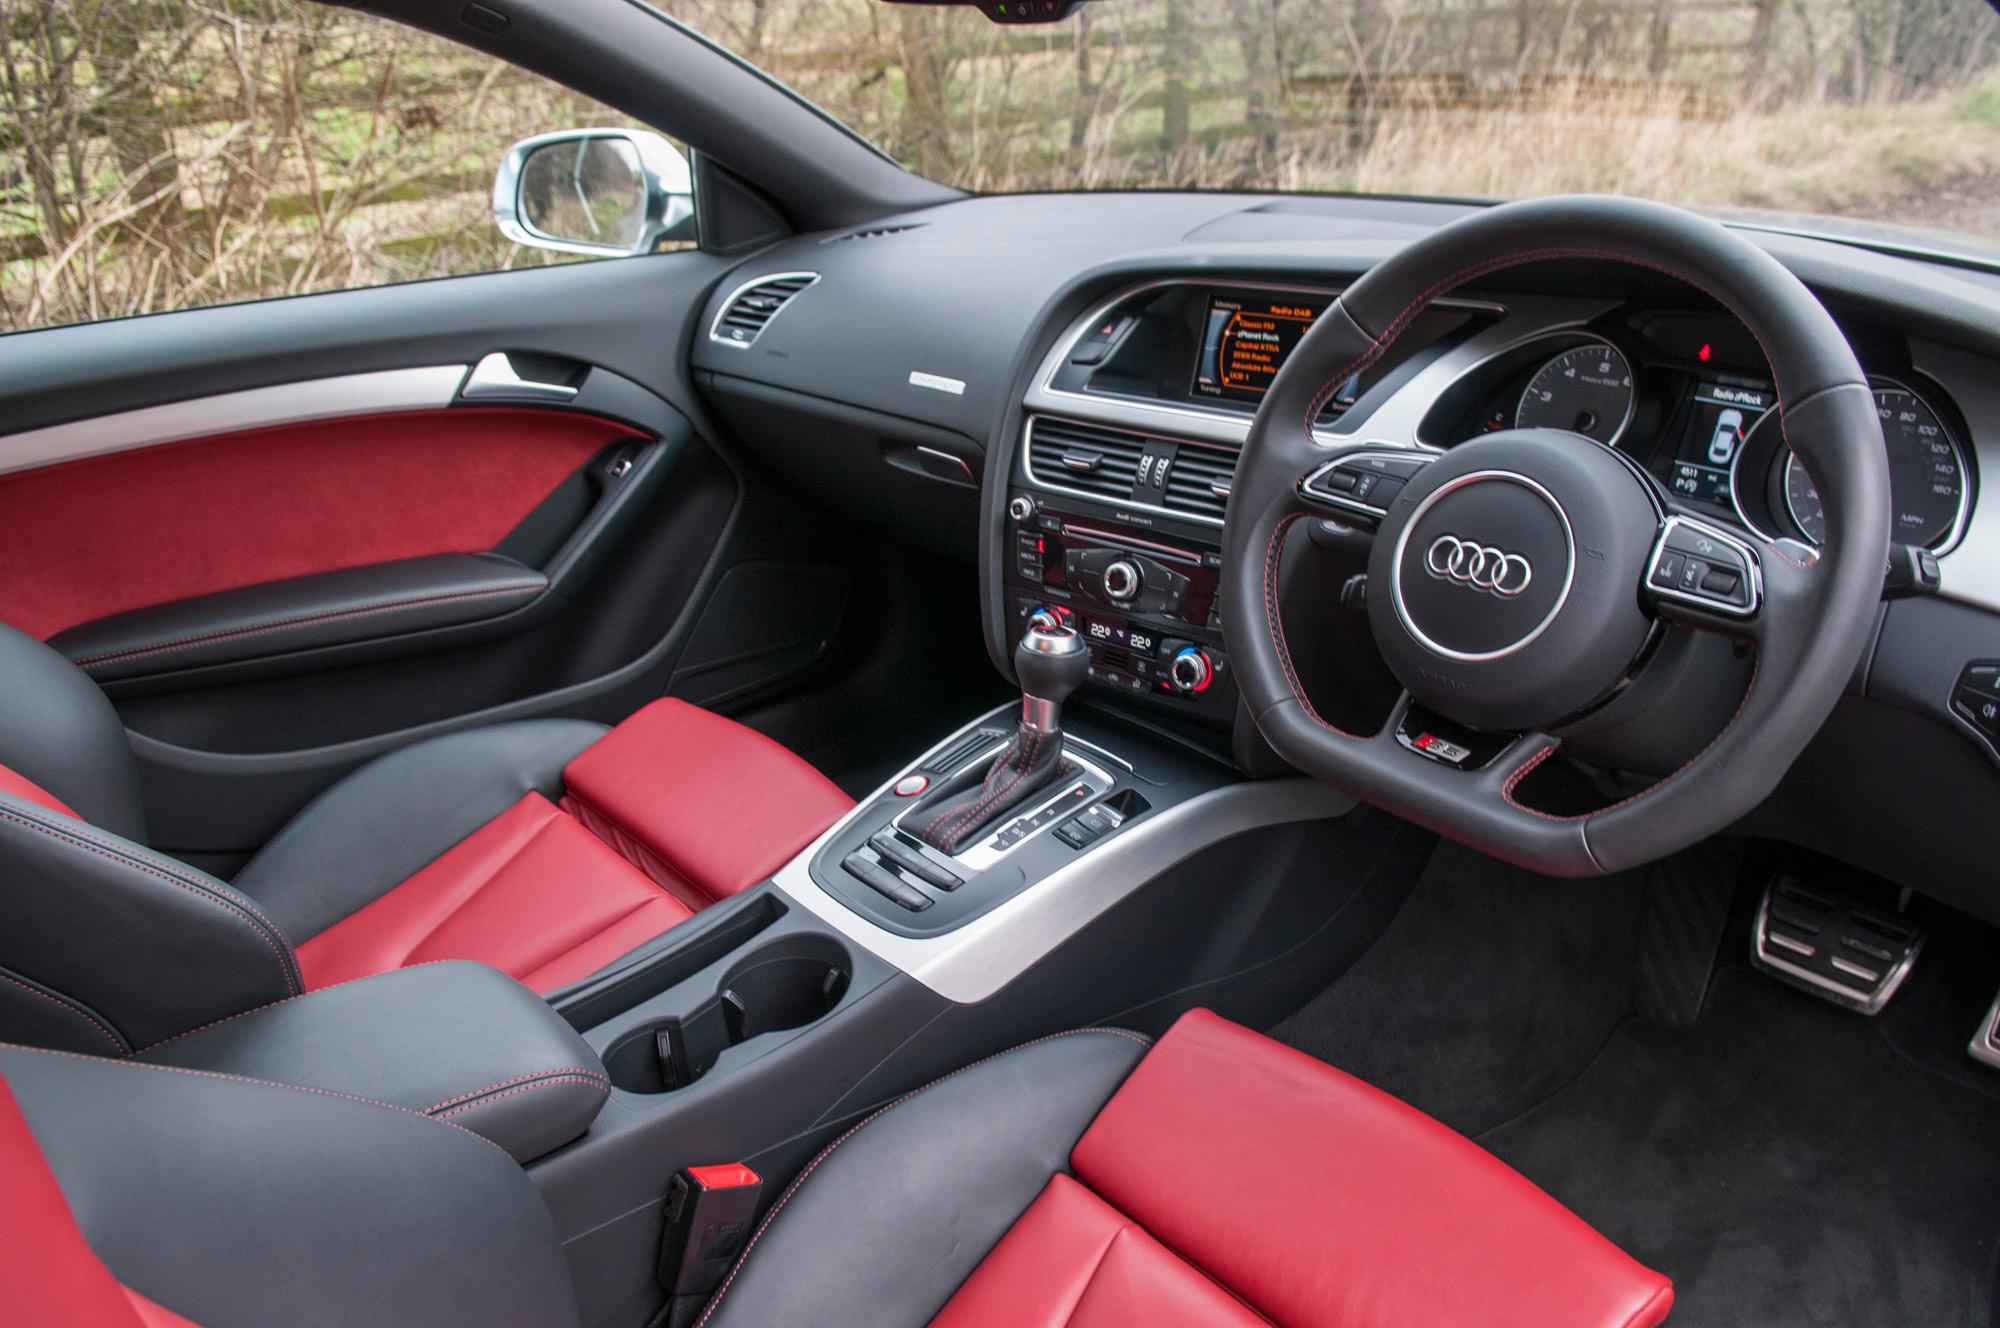 audi s5 v8 interior shot red leather yorkshire photography automotive